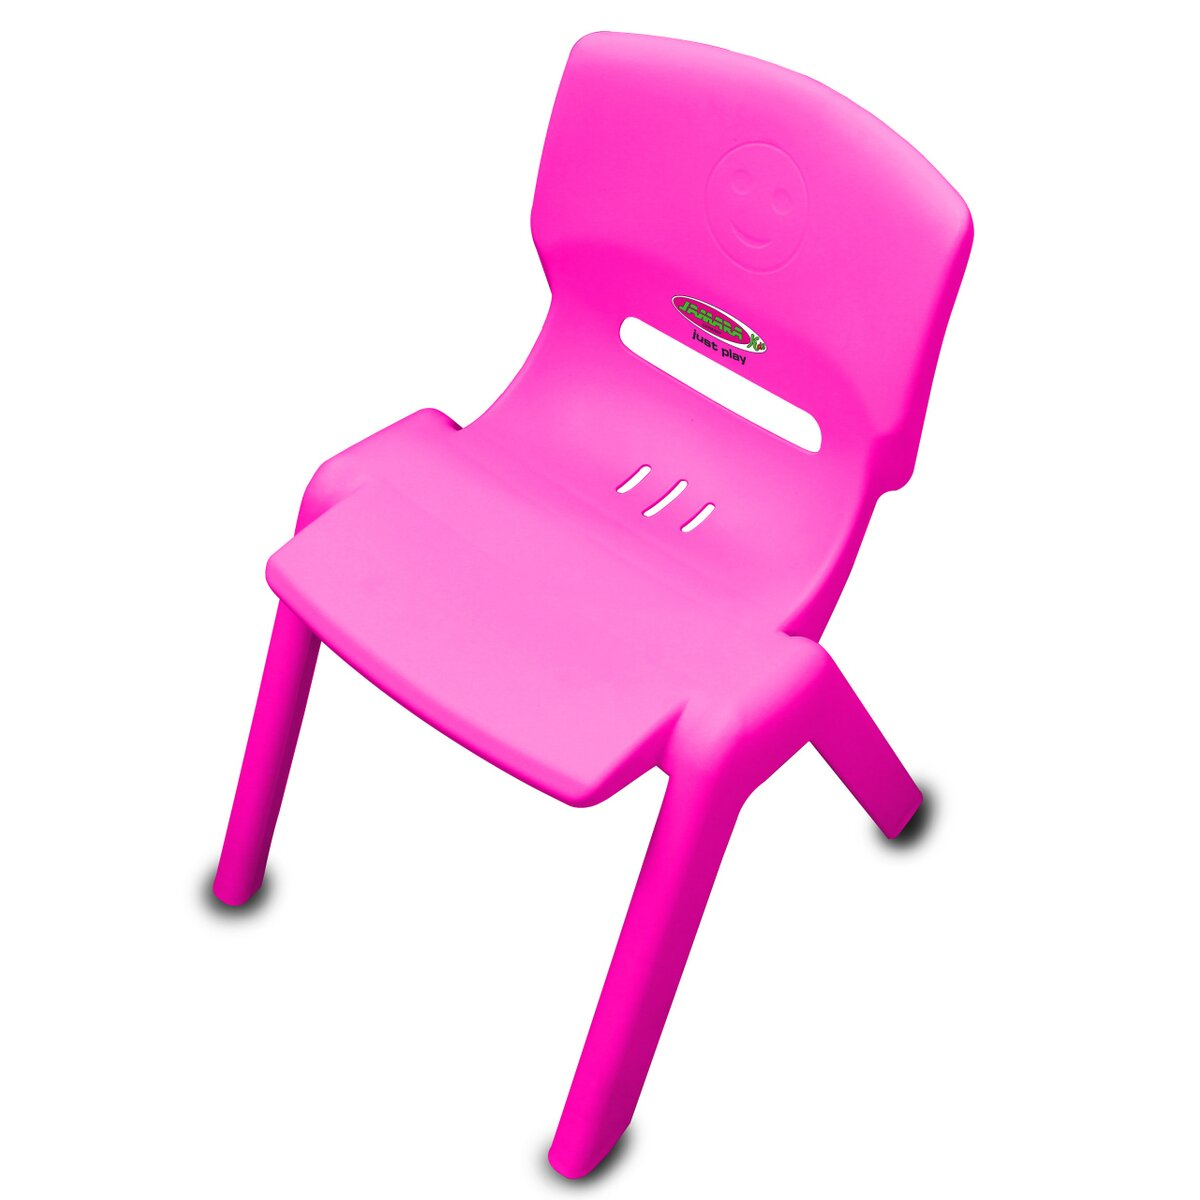 Jamara Dětská židle Smiley do 100 KG růžová